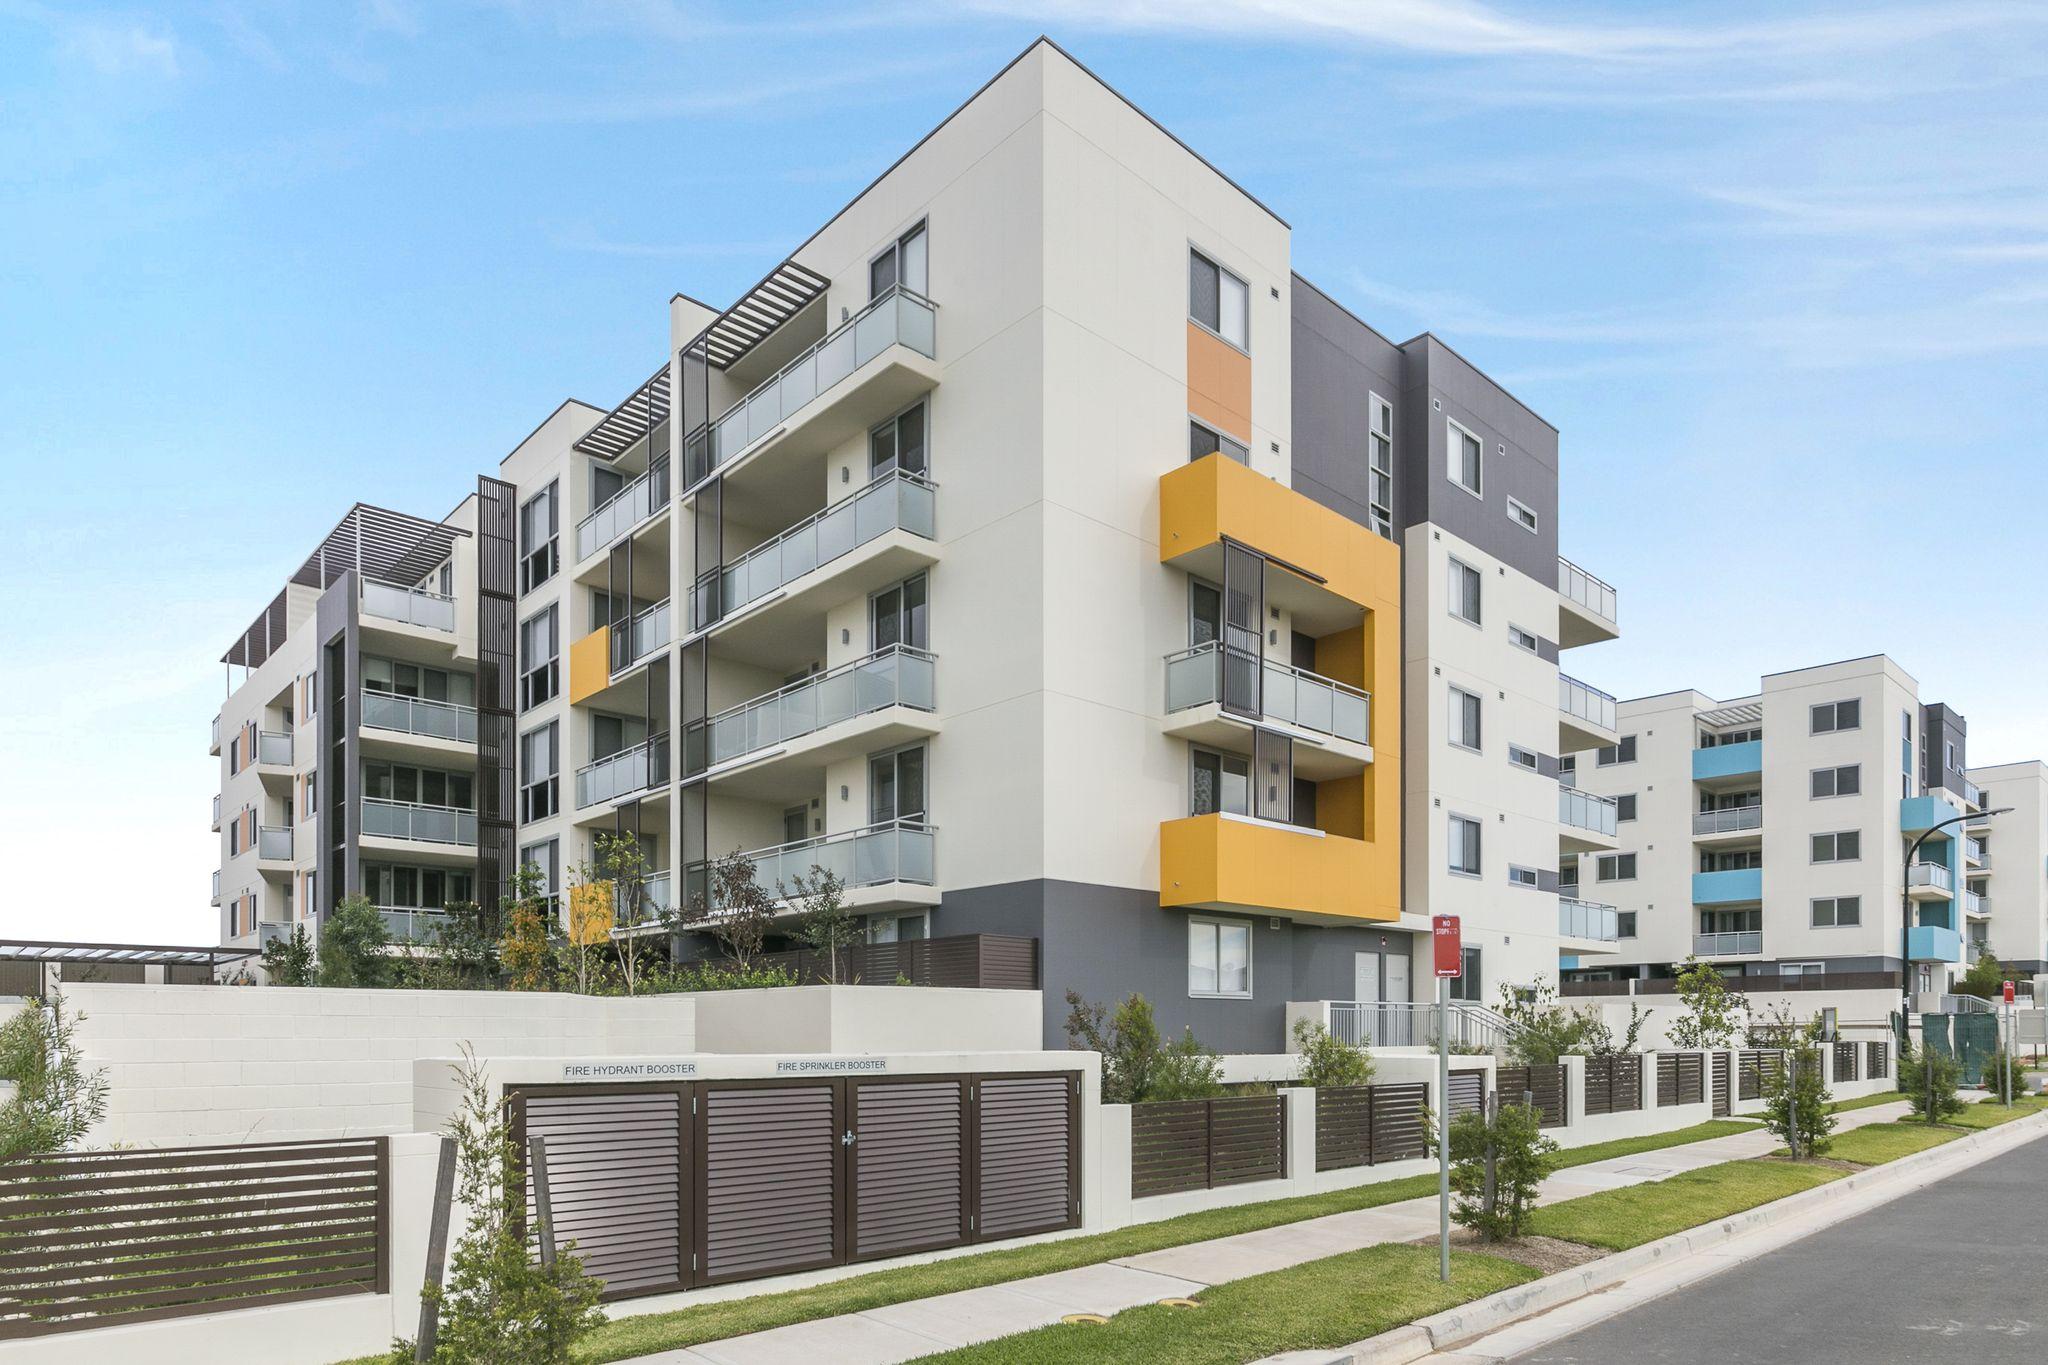 2 Bedrooms, Apartment, Leased, Rebecca Street , 2 Bathrooms, Listing ID 1466, Schofields , NSW, Australia, 2762,